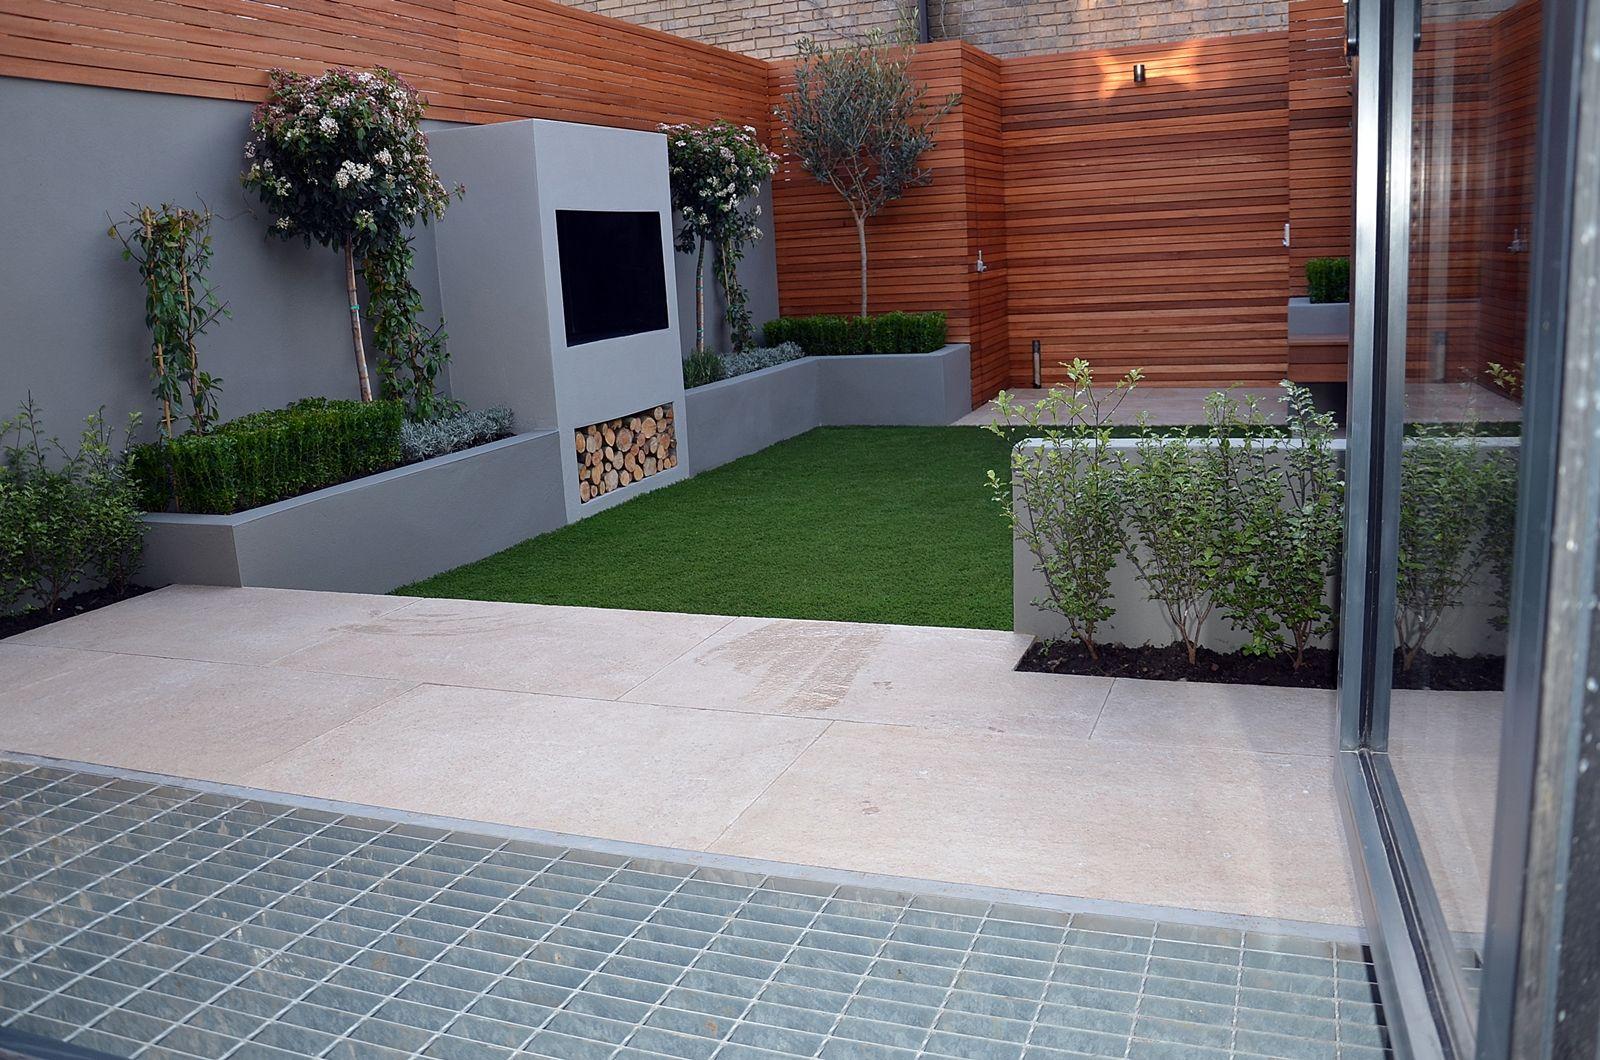 beige-limestone-paving-fake-artificial-grass-lawn-outdoor ...